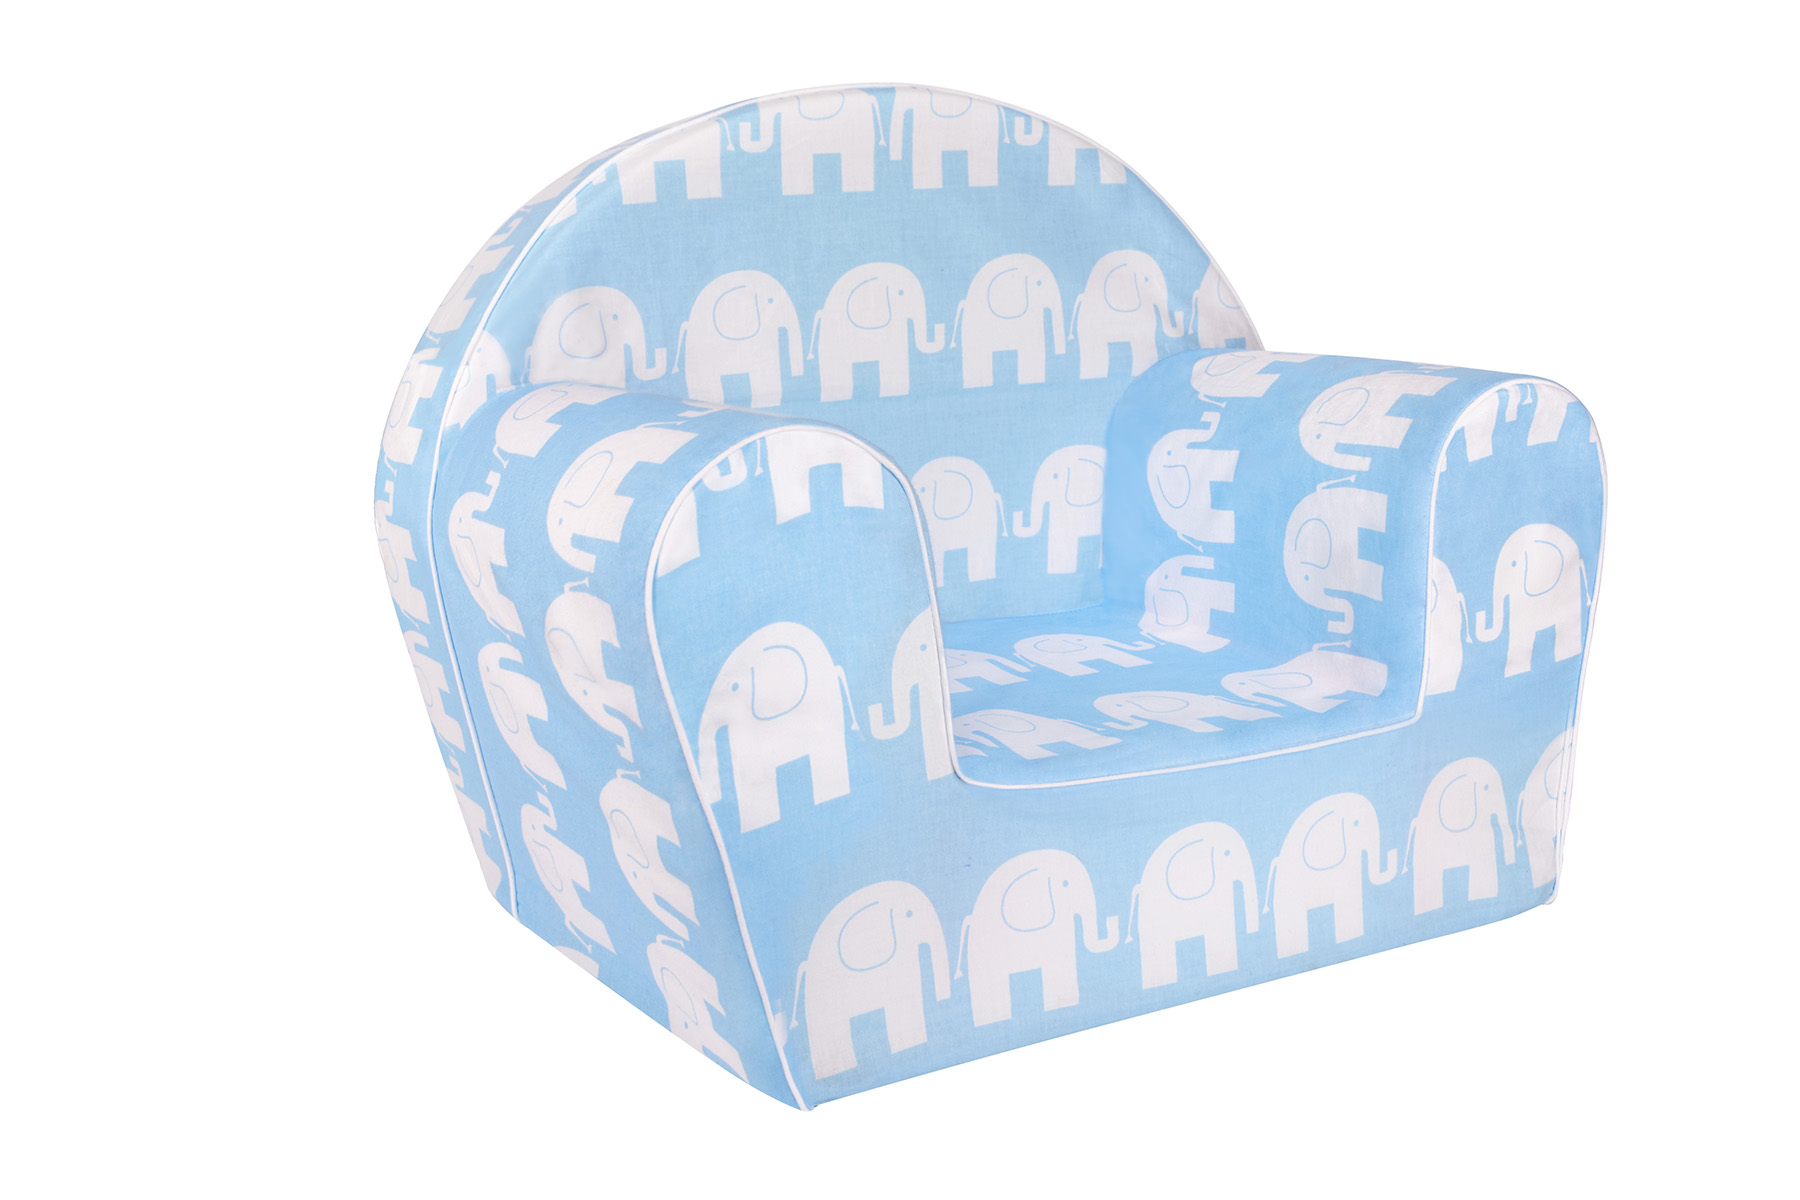 TEX-IM Dětské křesílko Baby Vzor: Bílý slon na modrém